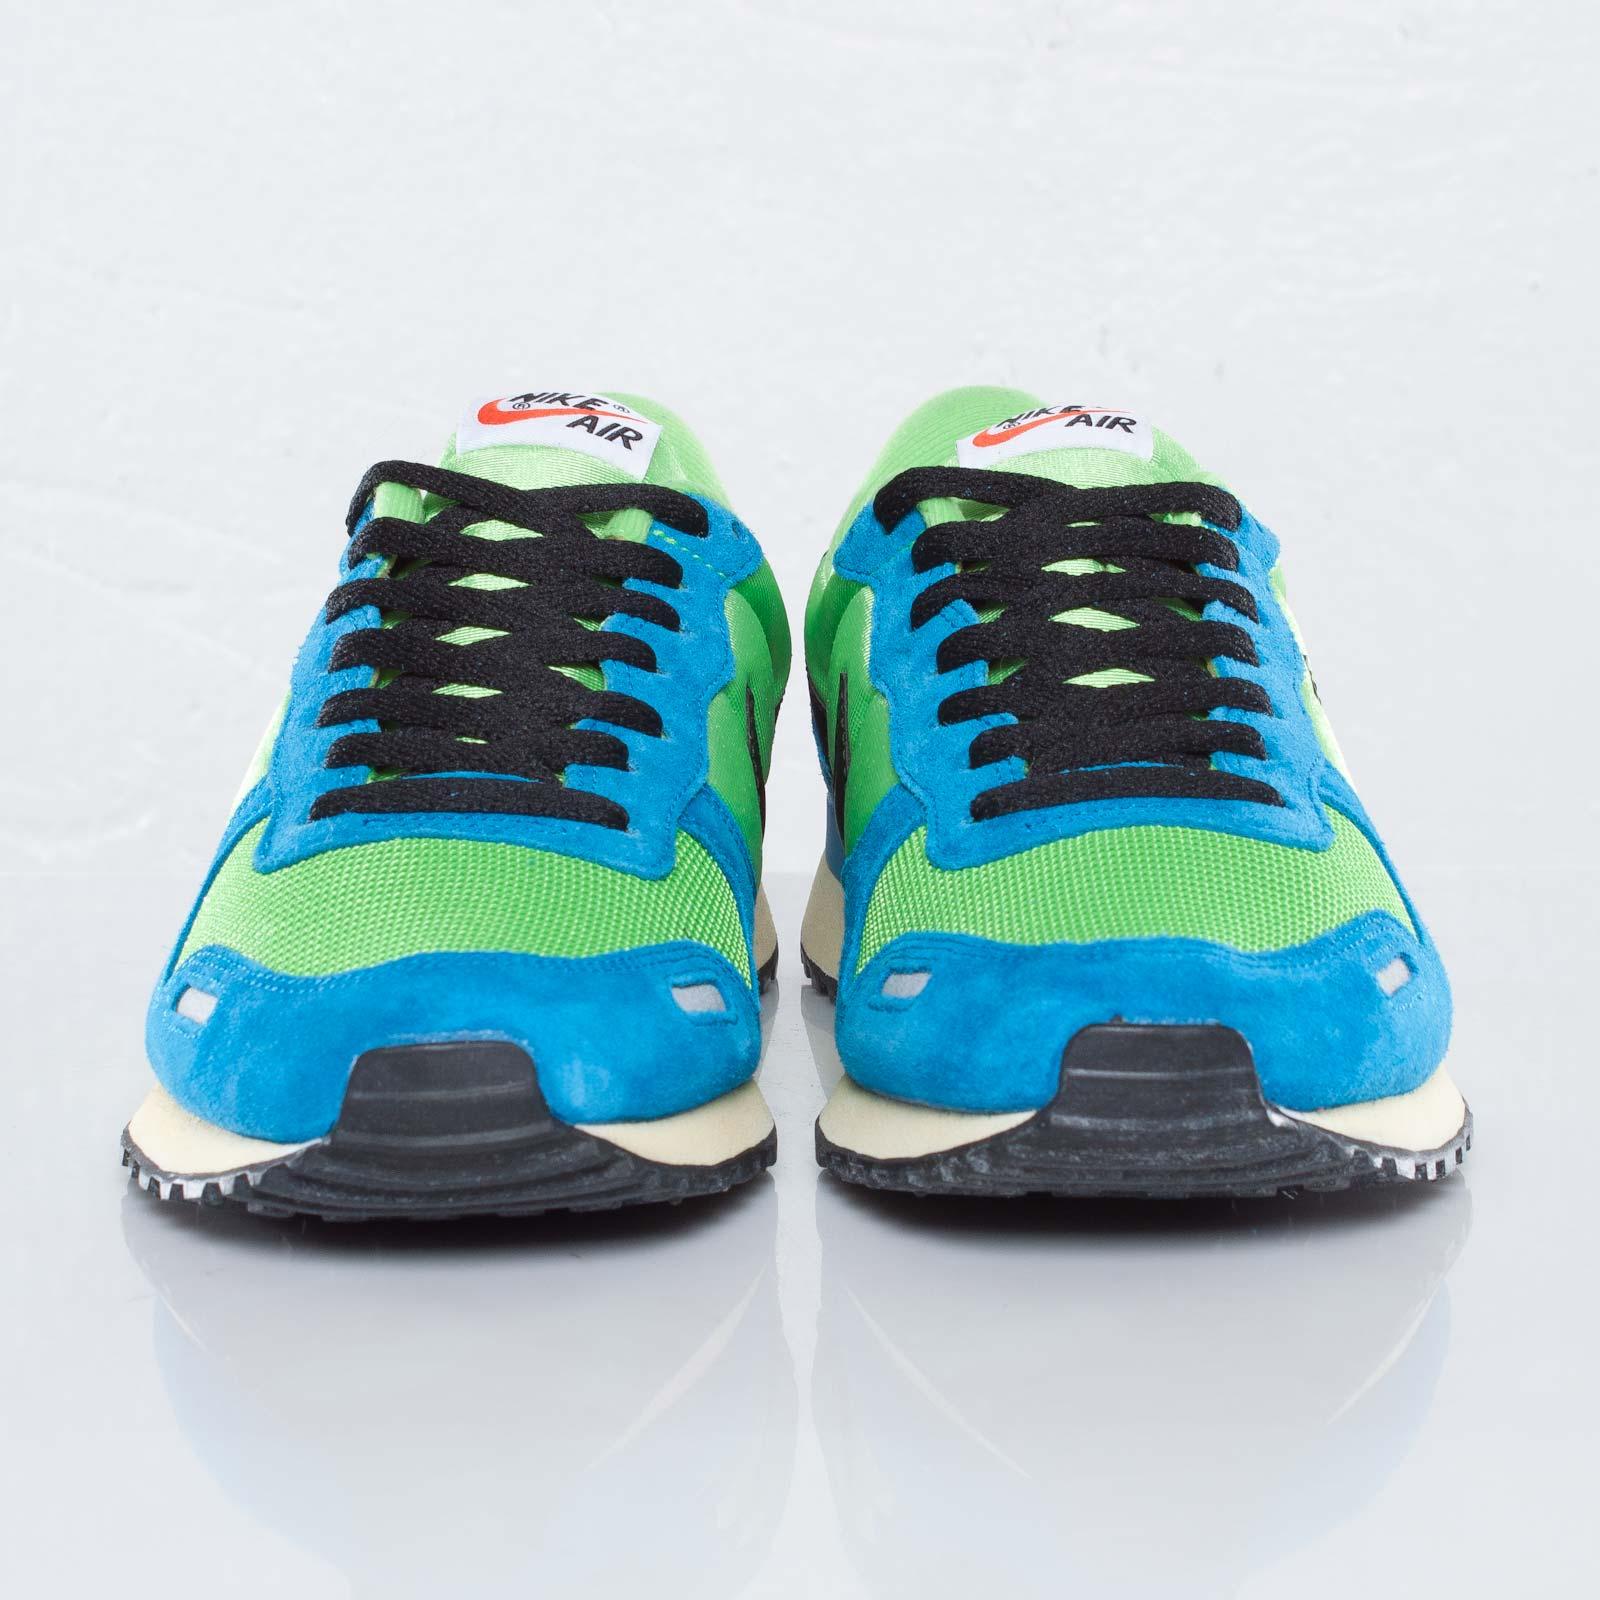 the best attitude 5dc99 f23f2 Nike Air Vortex Vintage - 110213 - Sneakersnstuff   sneakers   streetwear  online since 1999